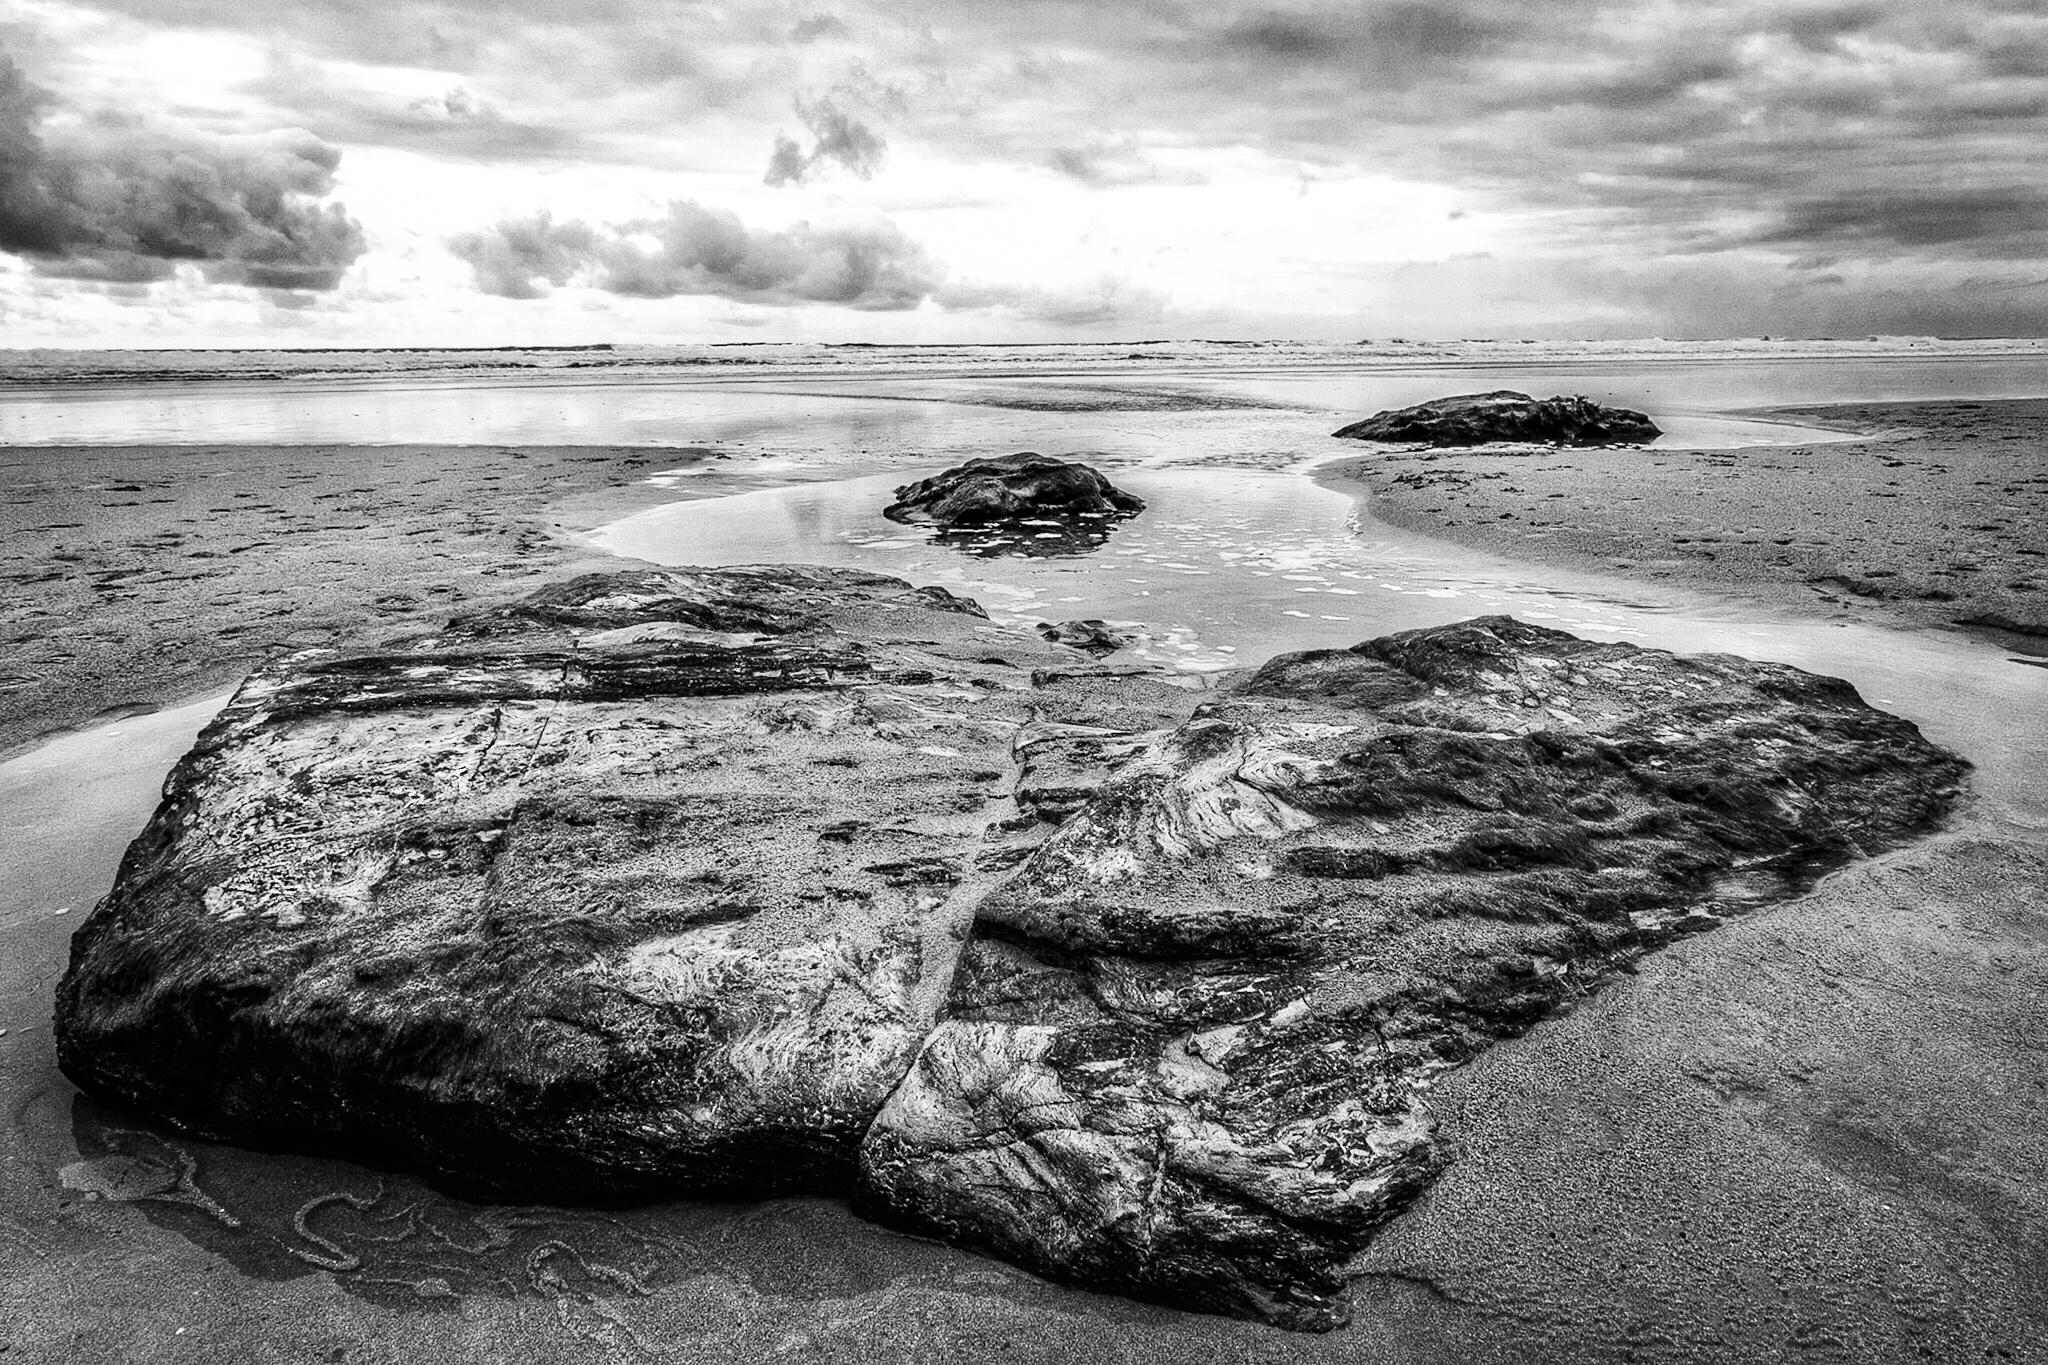 Watergate Bay beach by landscape photographer Rick McEvoy